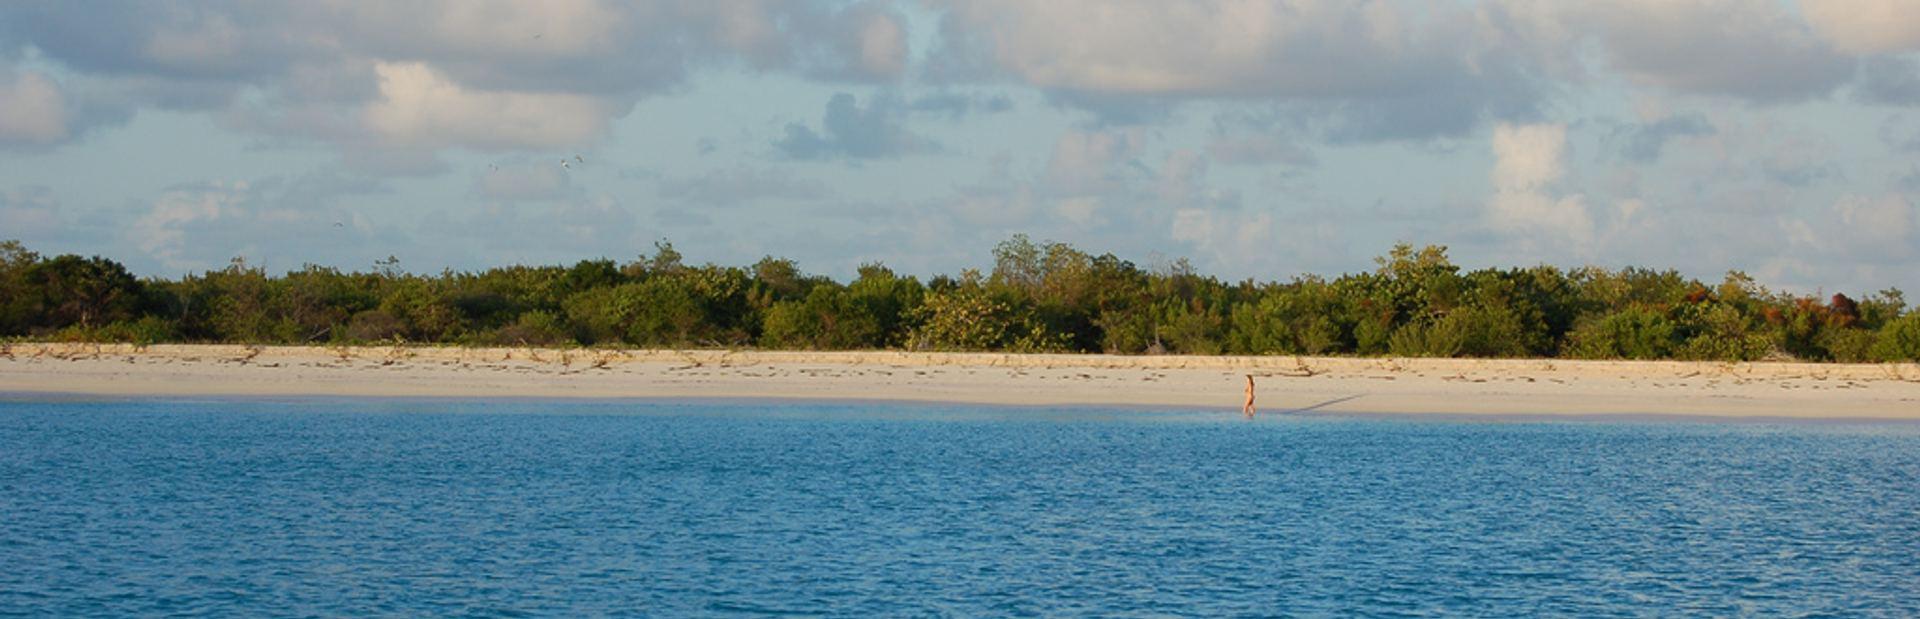 Barbuda photo tour